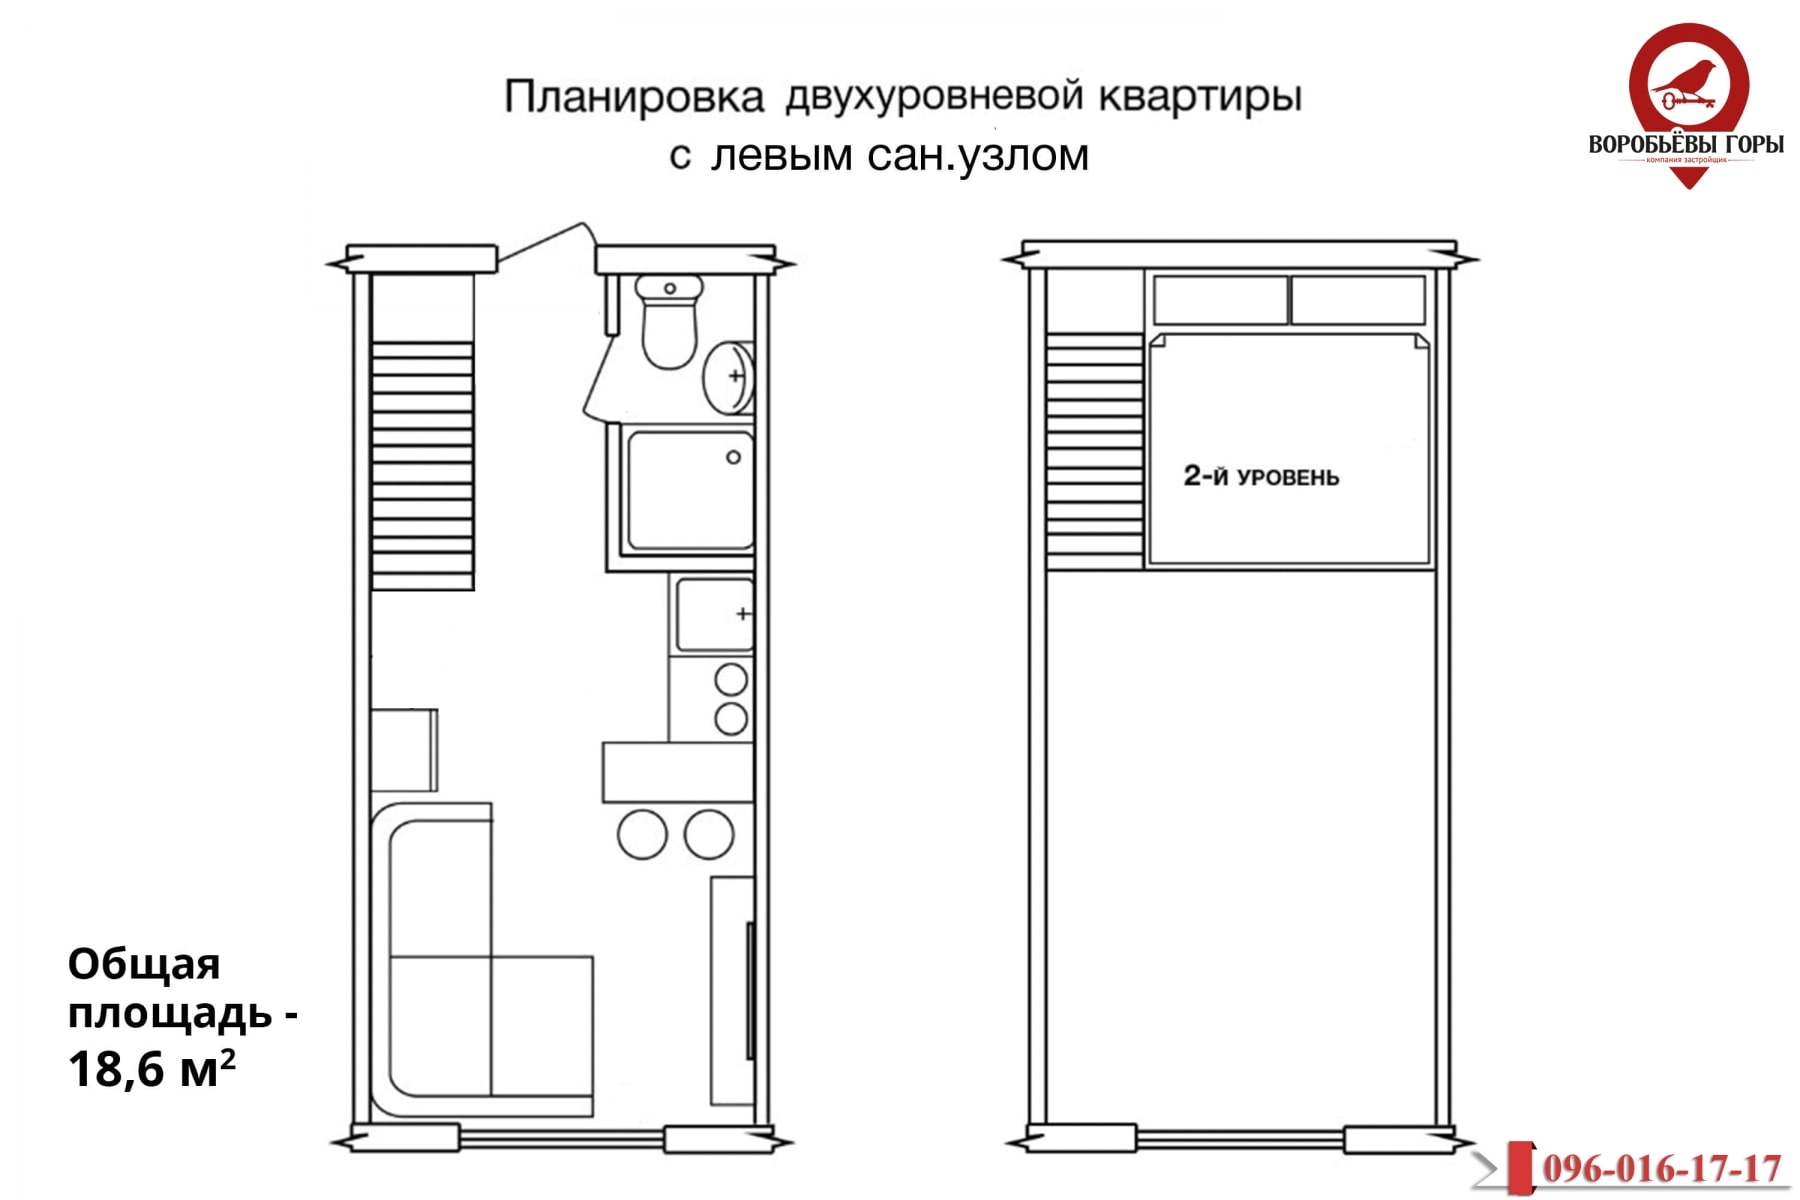 двухуровневая квартира 19 м2